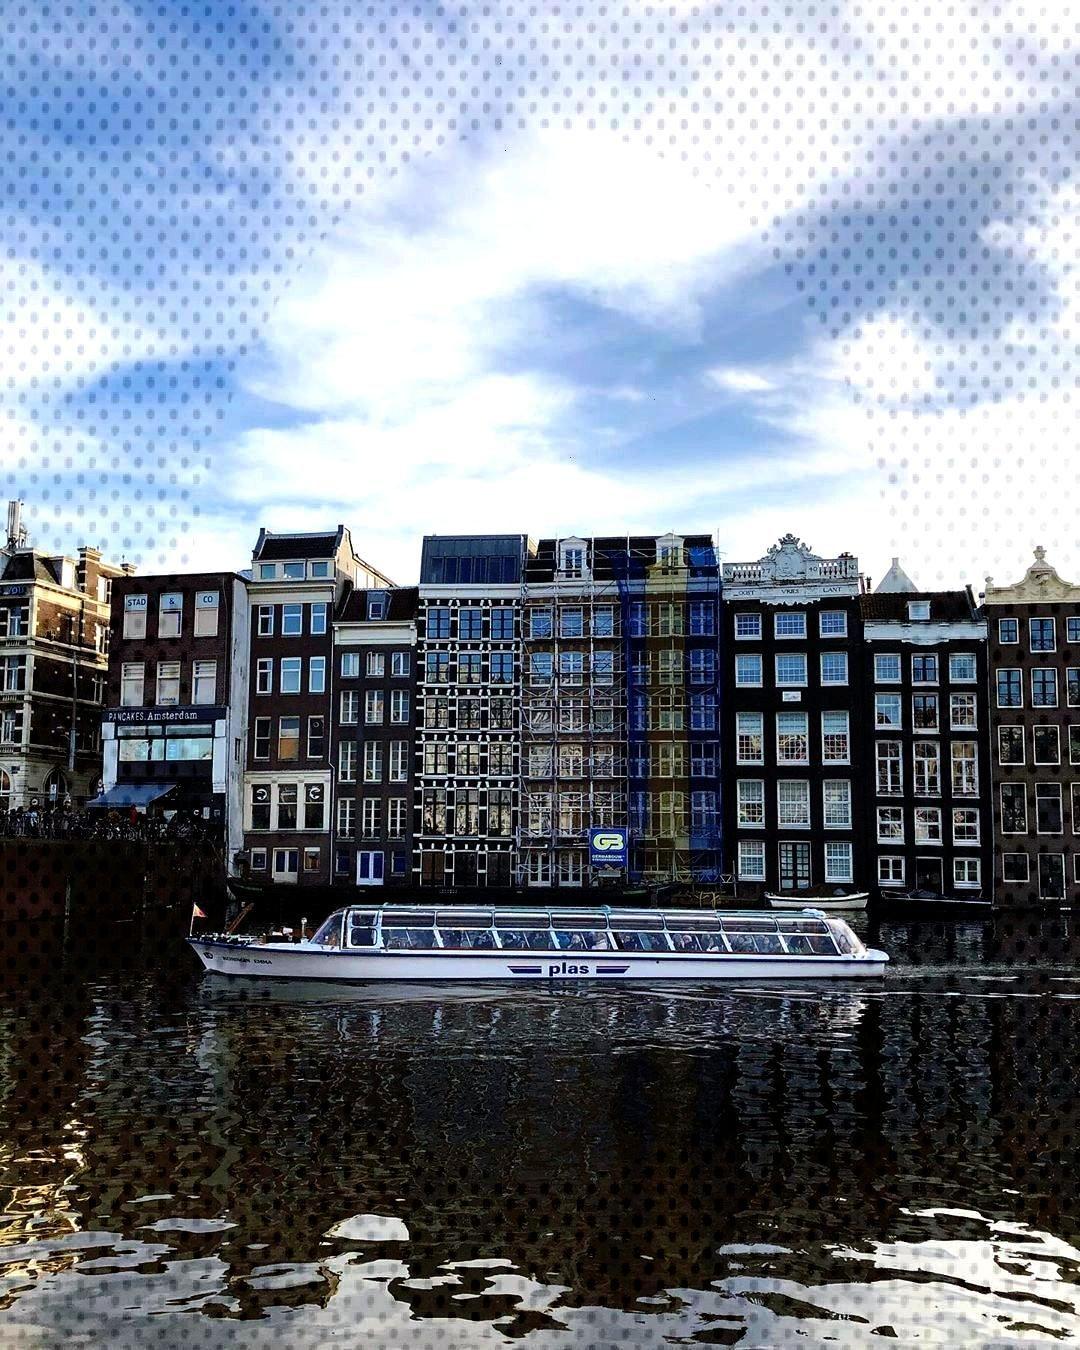 Amsterdam, isn't it?Typical Amsterdam, isn't it?  10+ Hidden Gems & Secret Spots in Belgium You